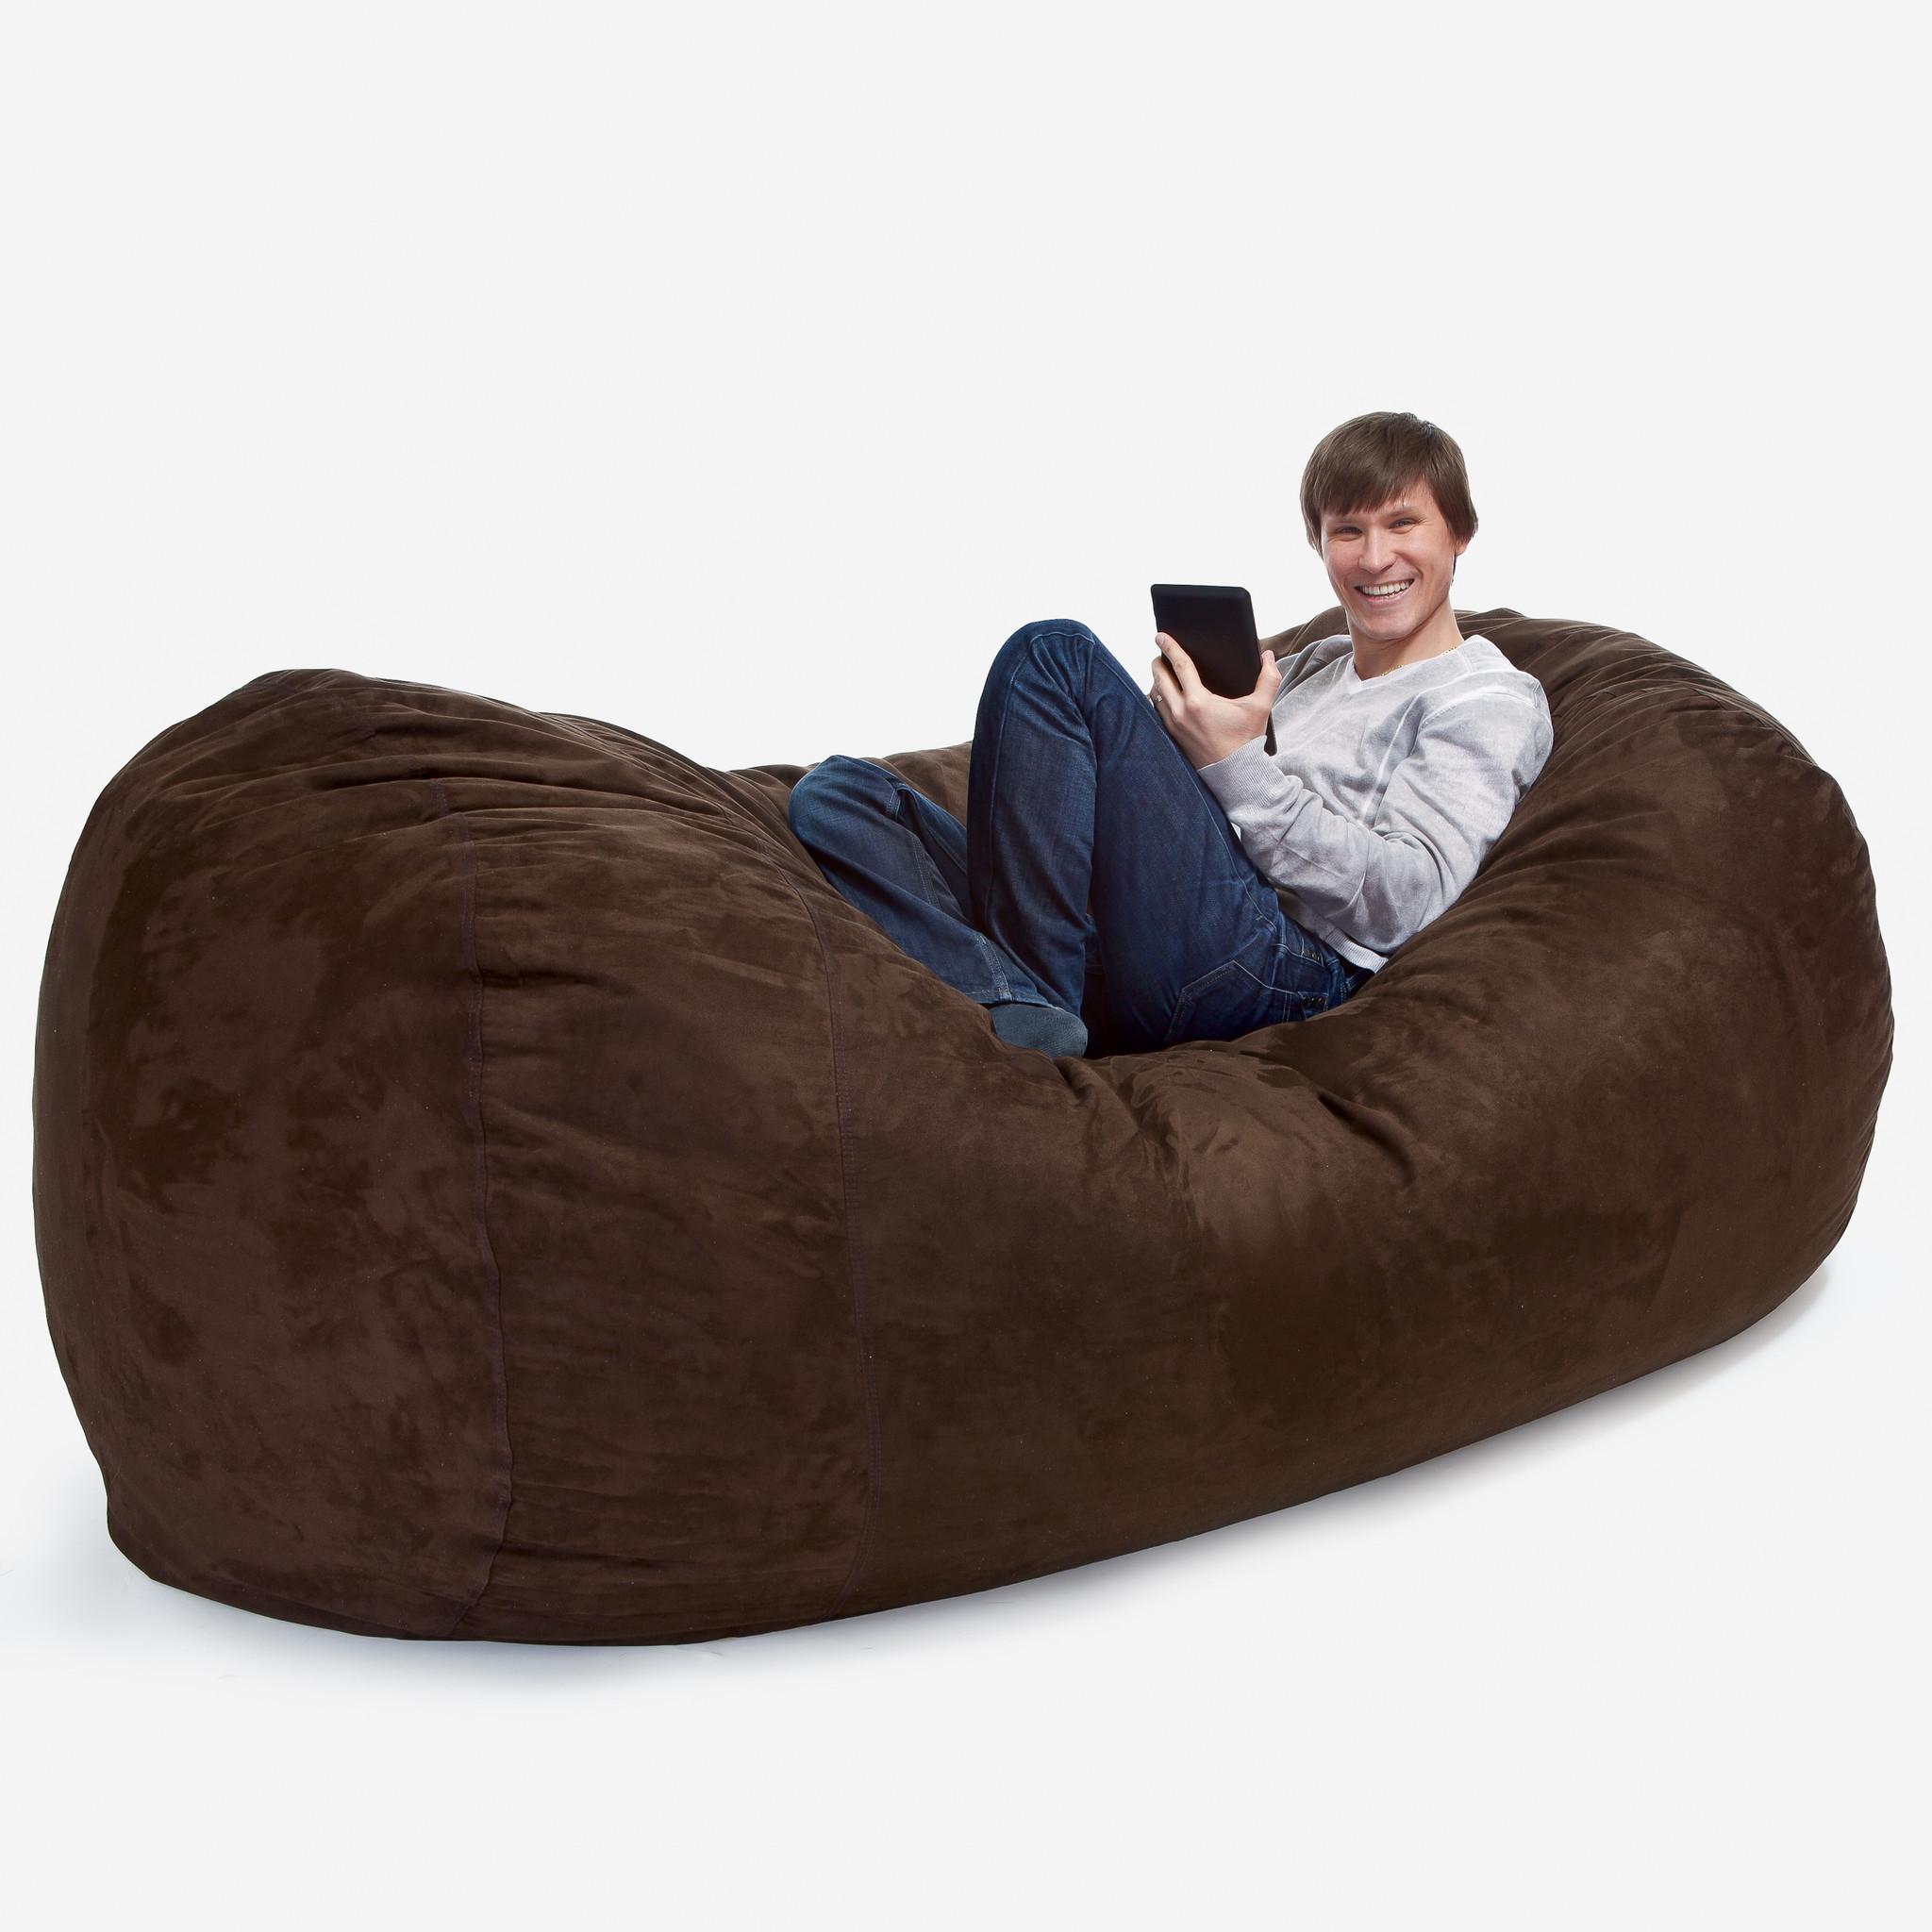 outdoor bean bag chair